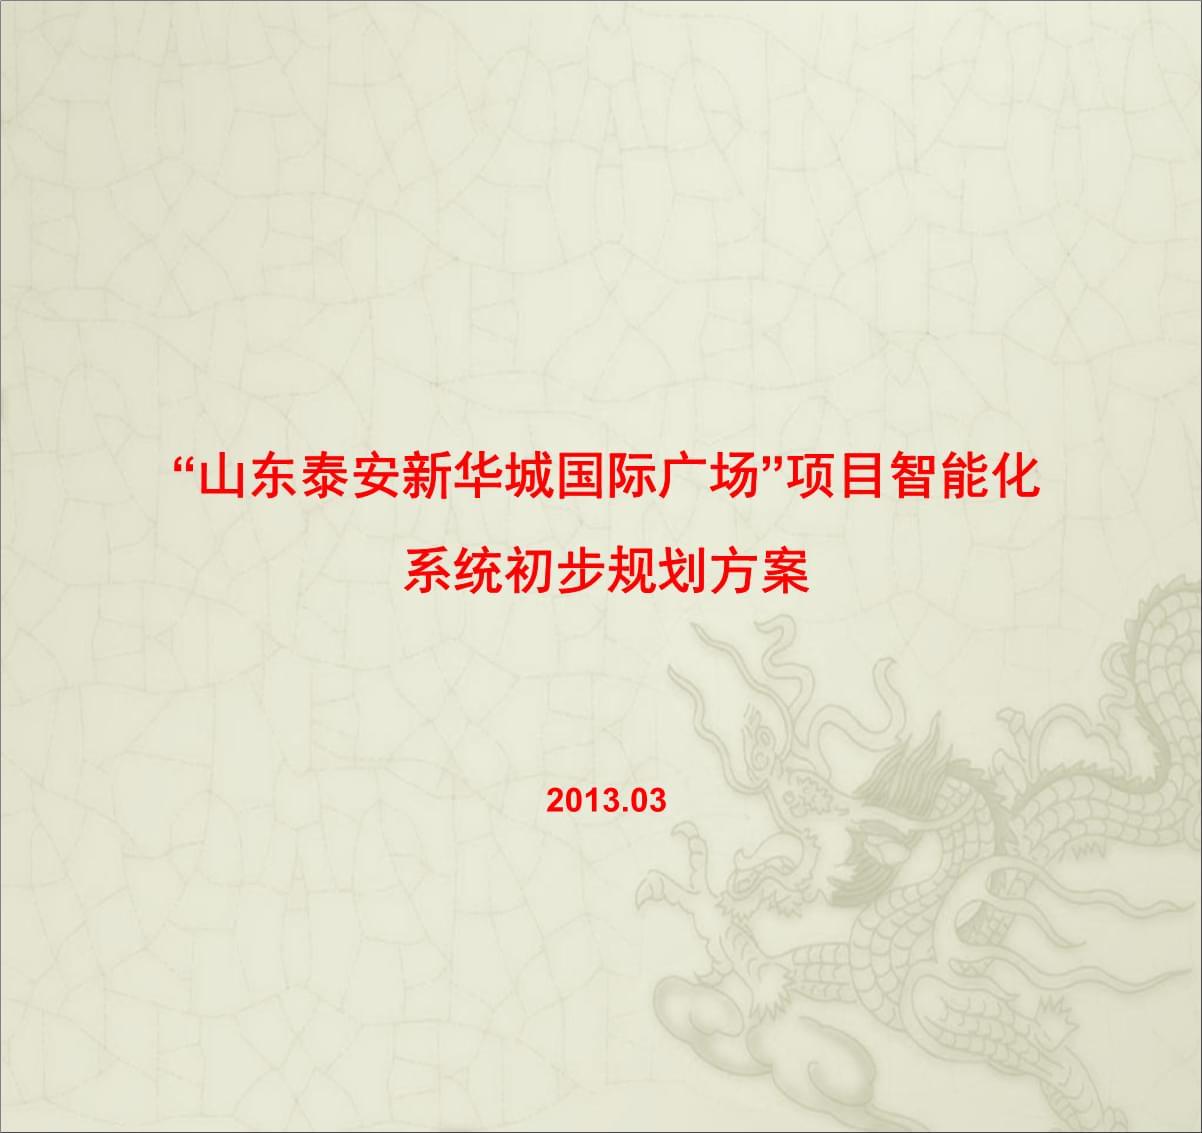 XX国际广场智能化系统方案.ppt